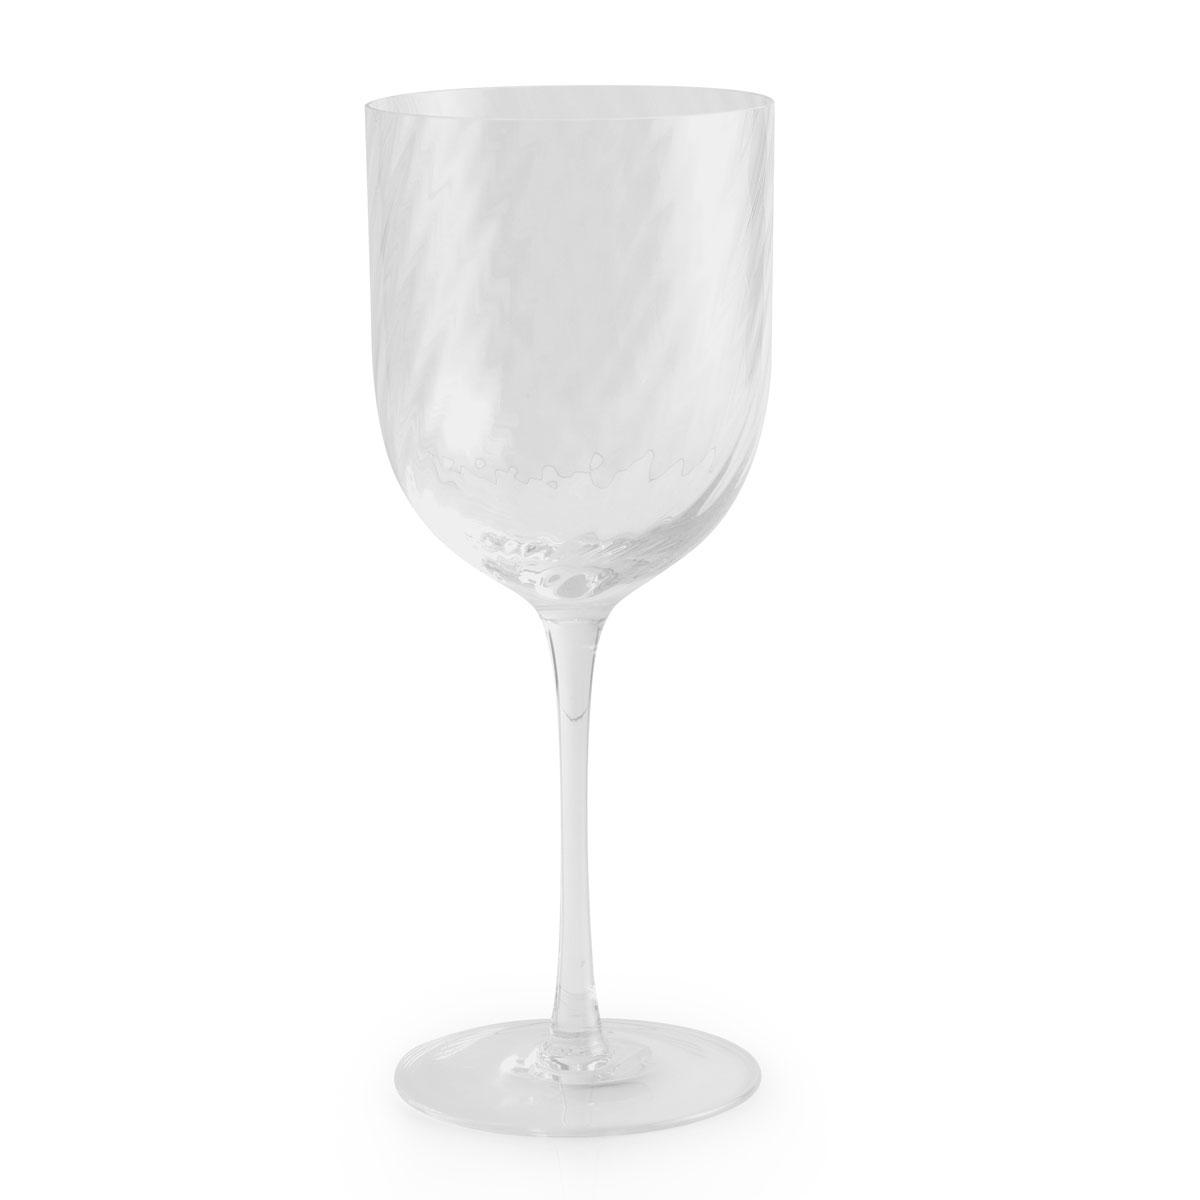 Michael Aram Twist Diamond Wine Glass, Single